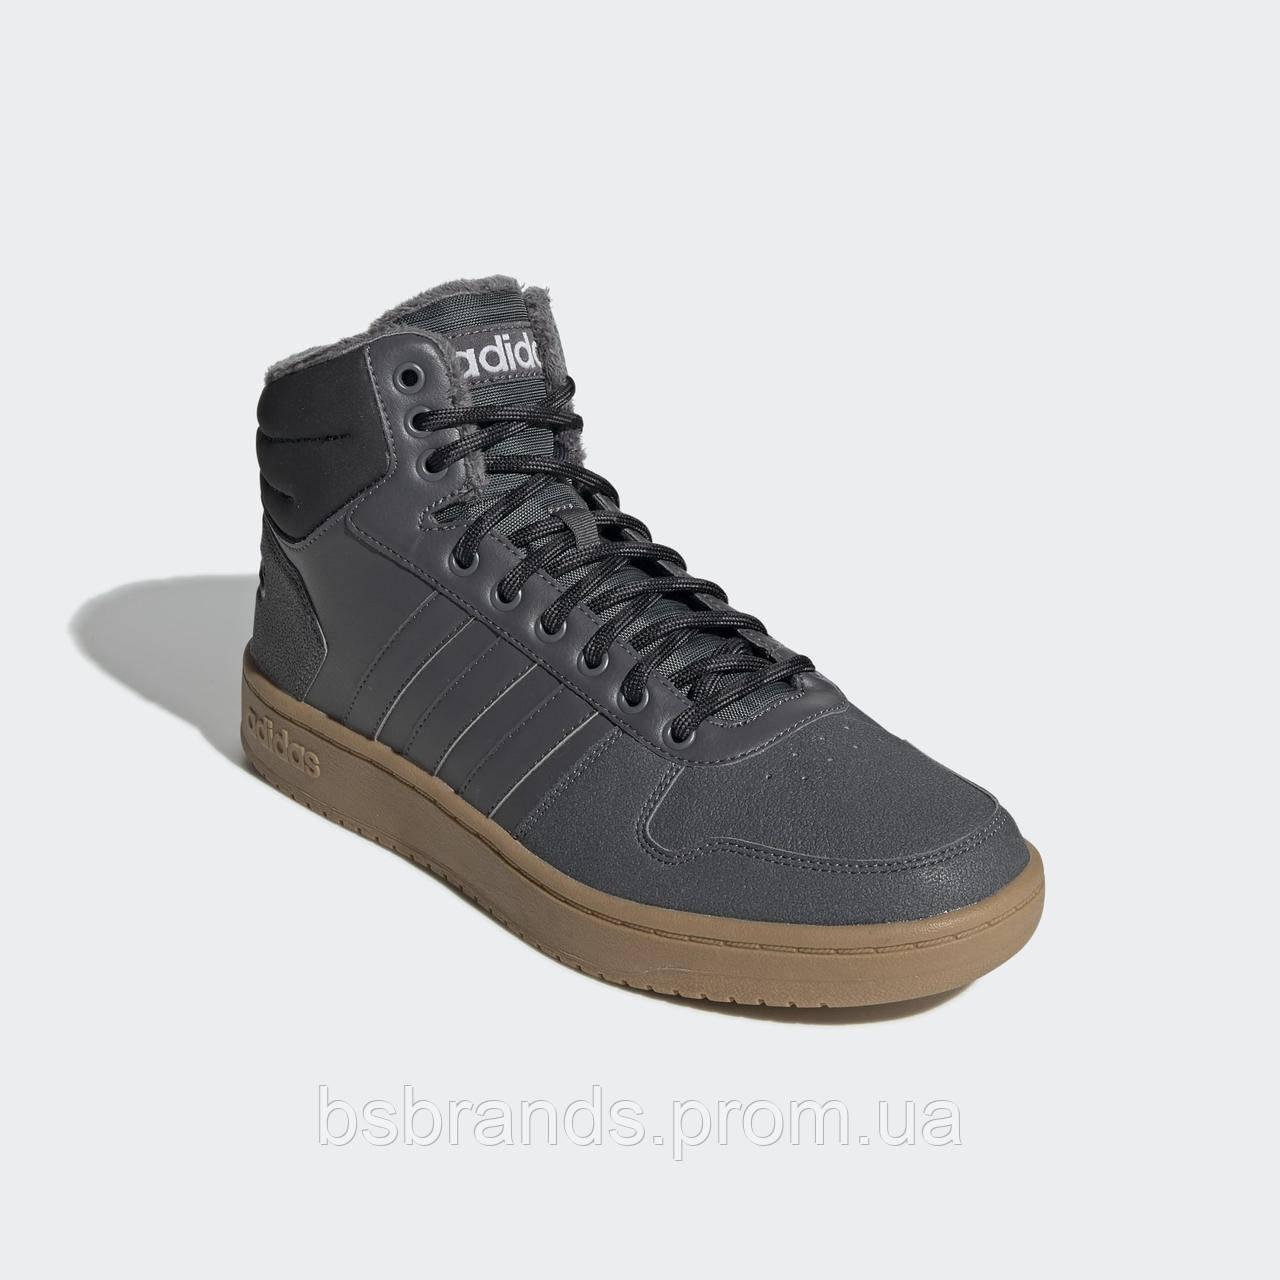 Мужские зимние кроссовки Adidas Neo Hoops 2.0 Mid (Артикул: EE7373)